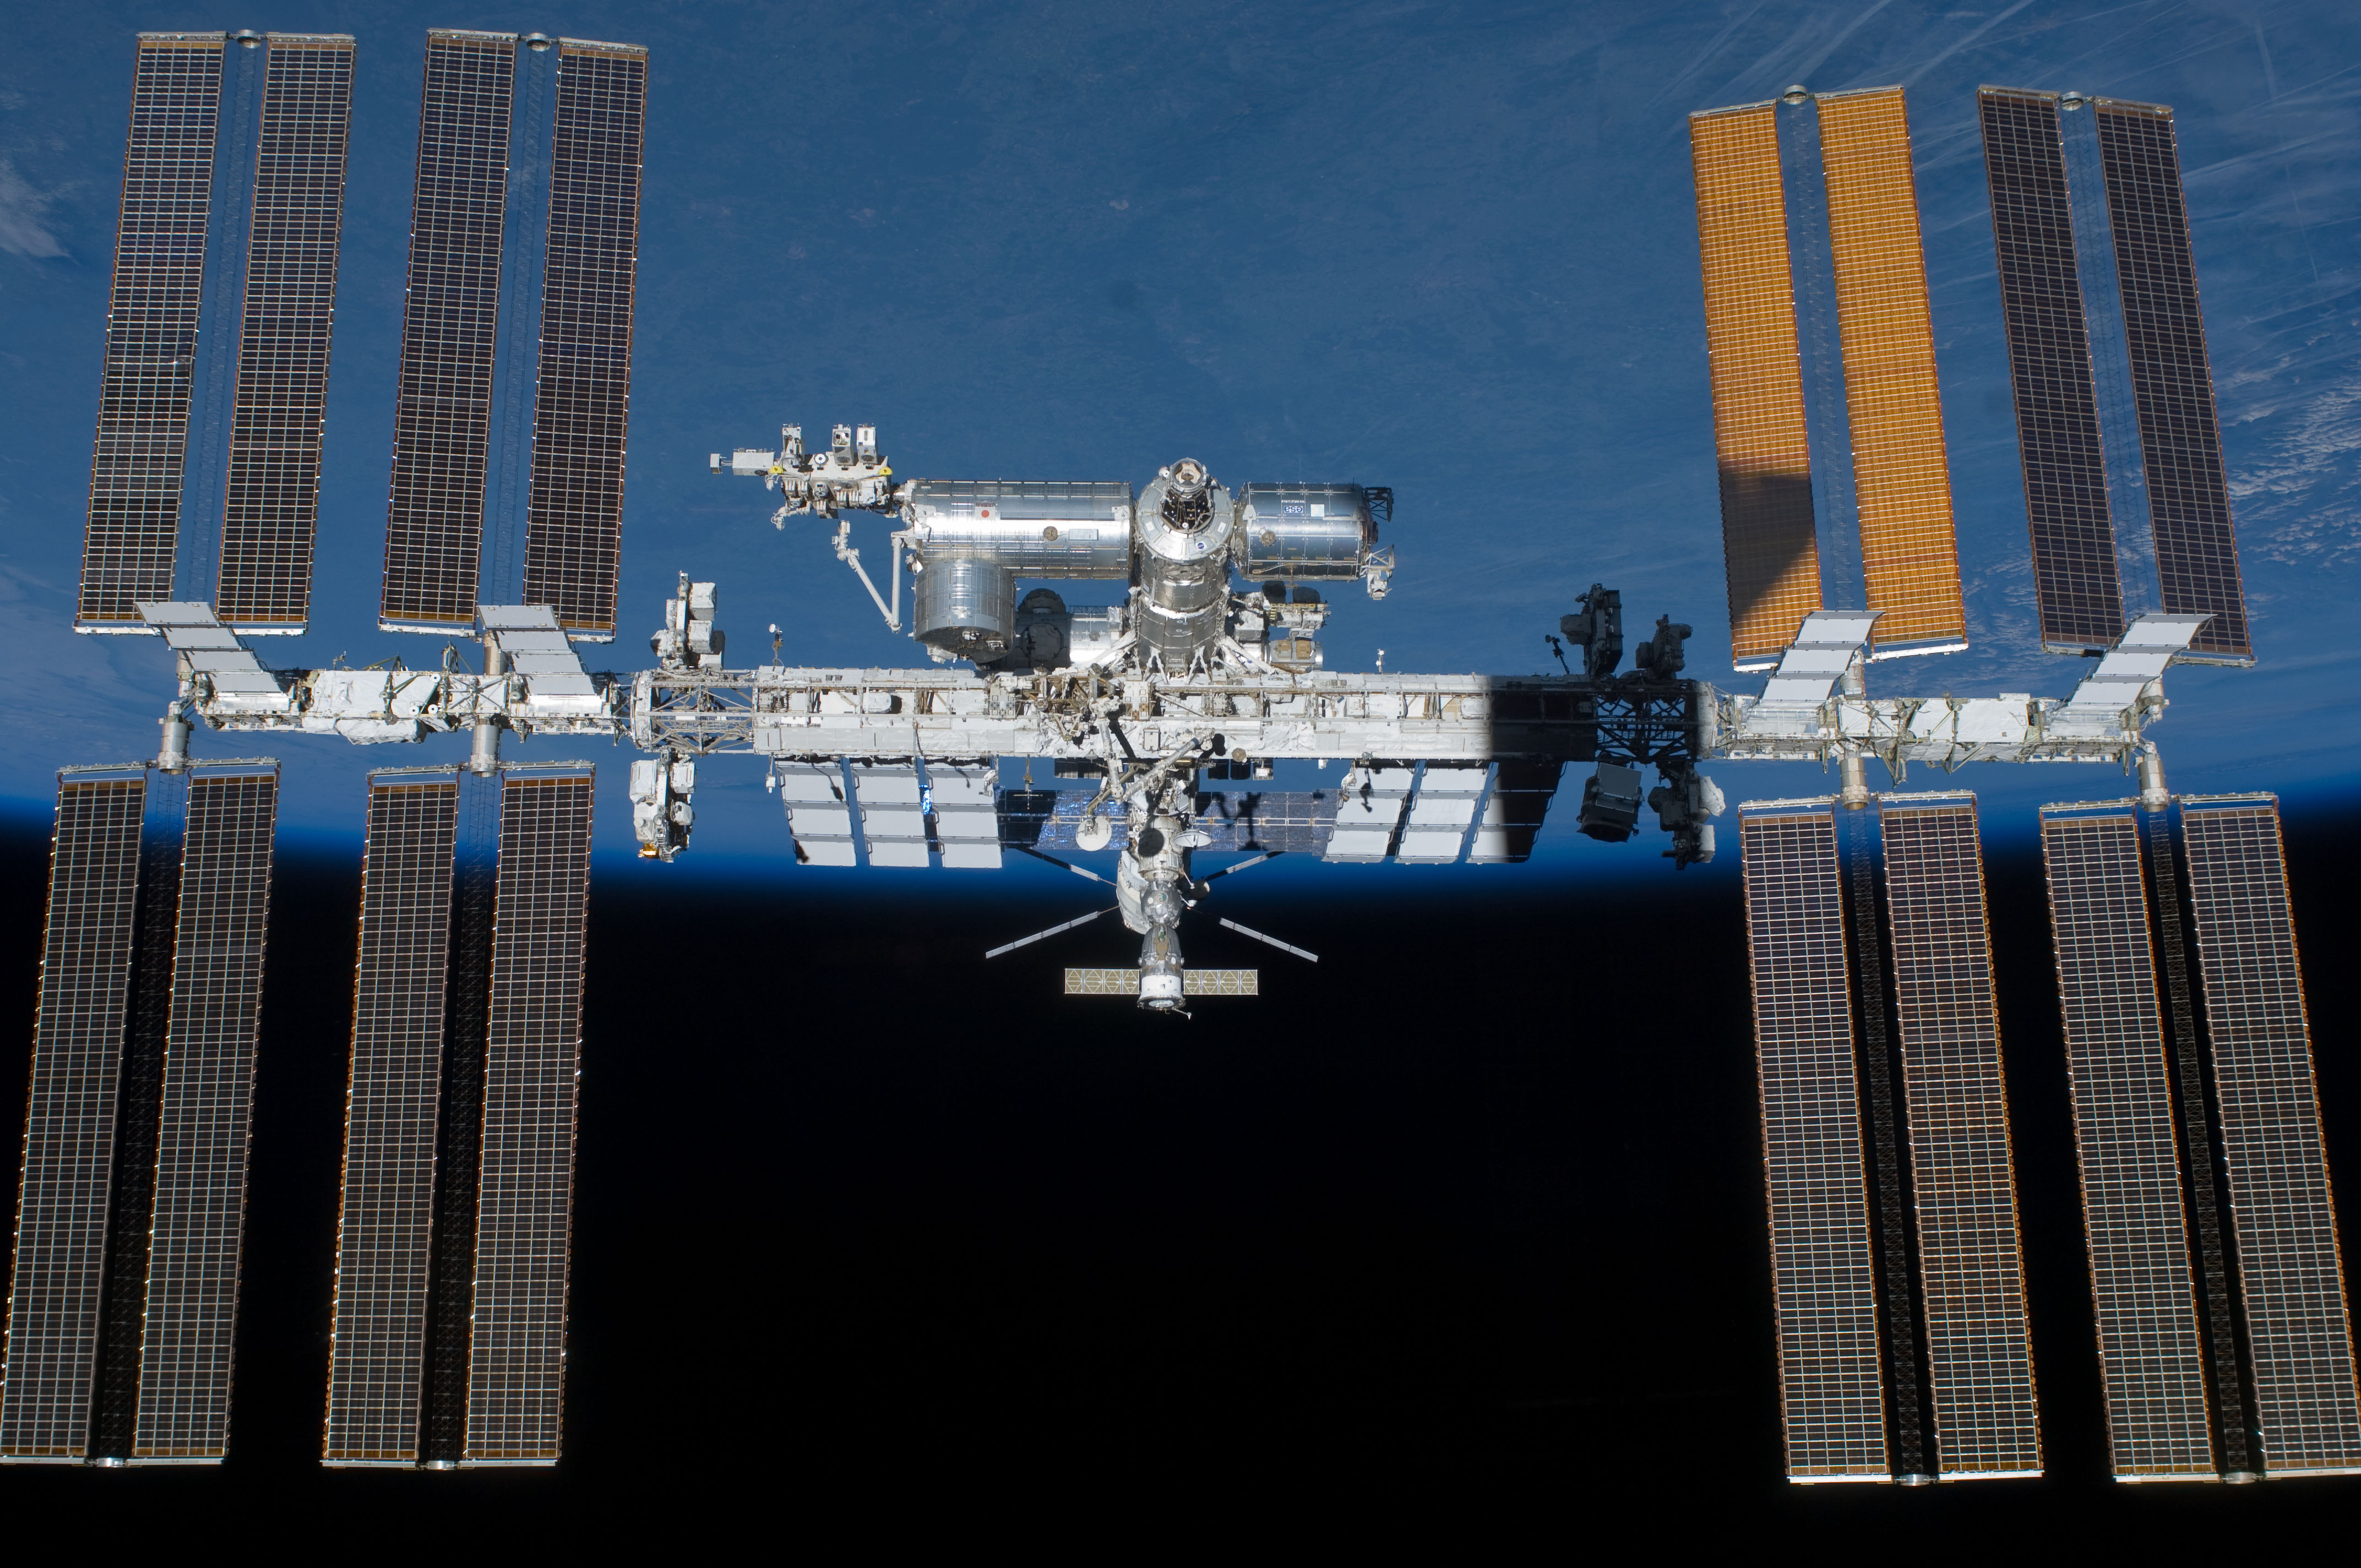 Russian Cargo Ship Failure Won't Endanger Space Station Crew, NASA Says